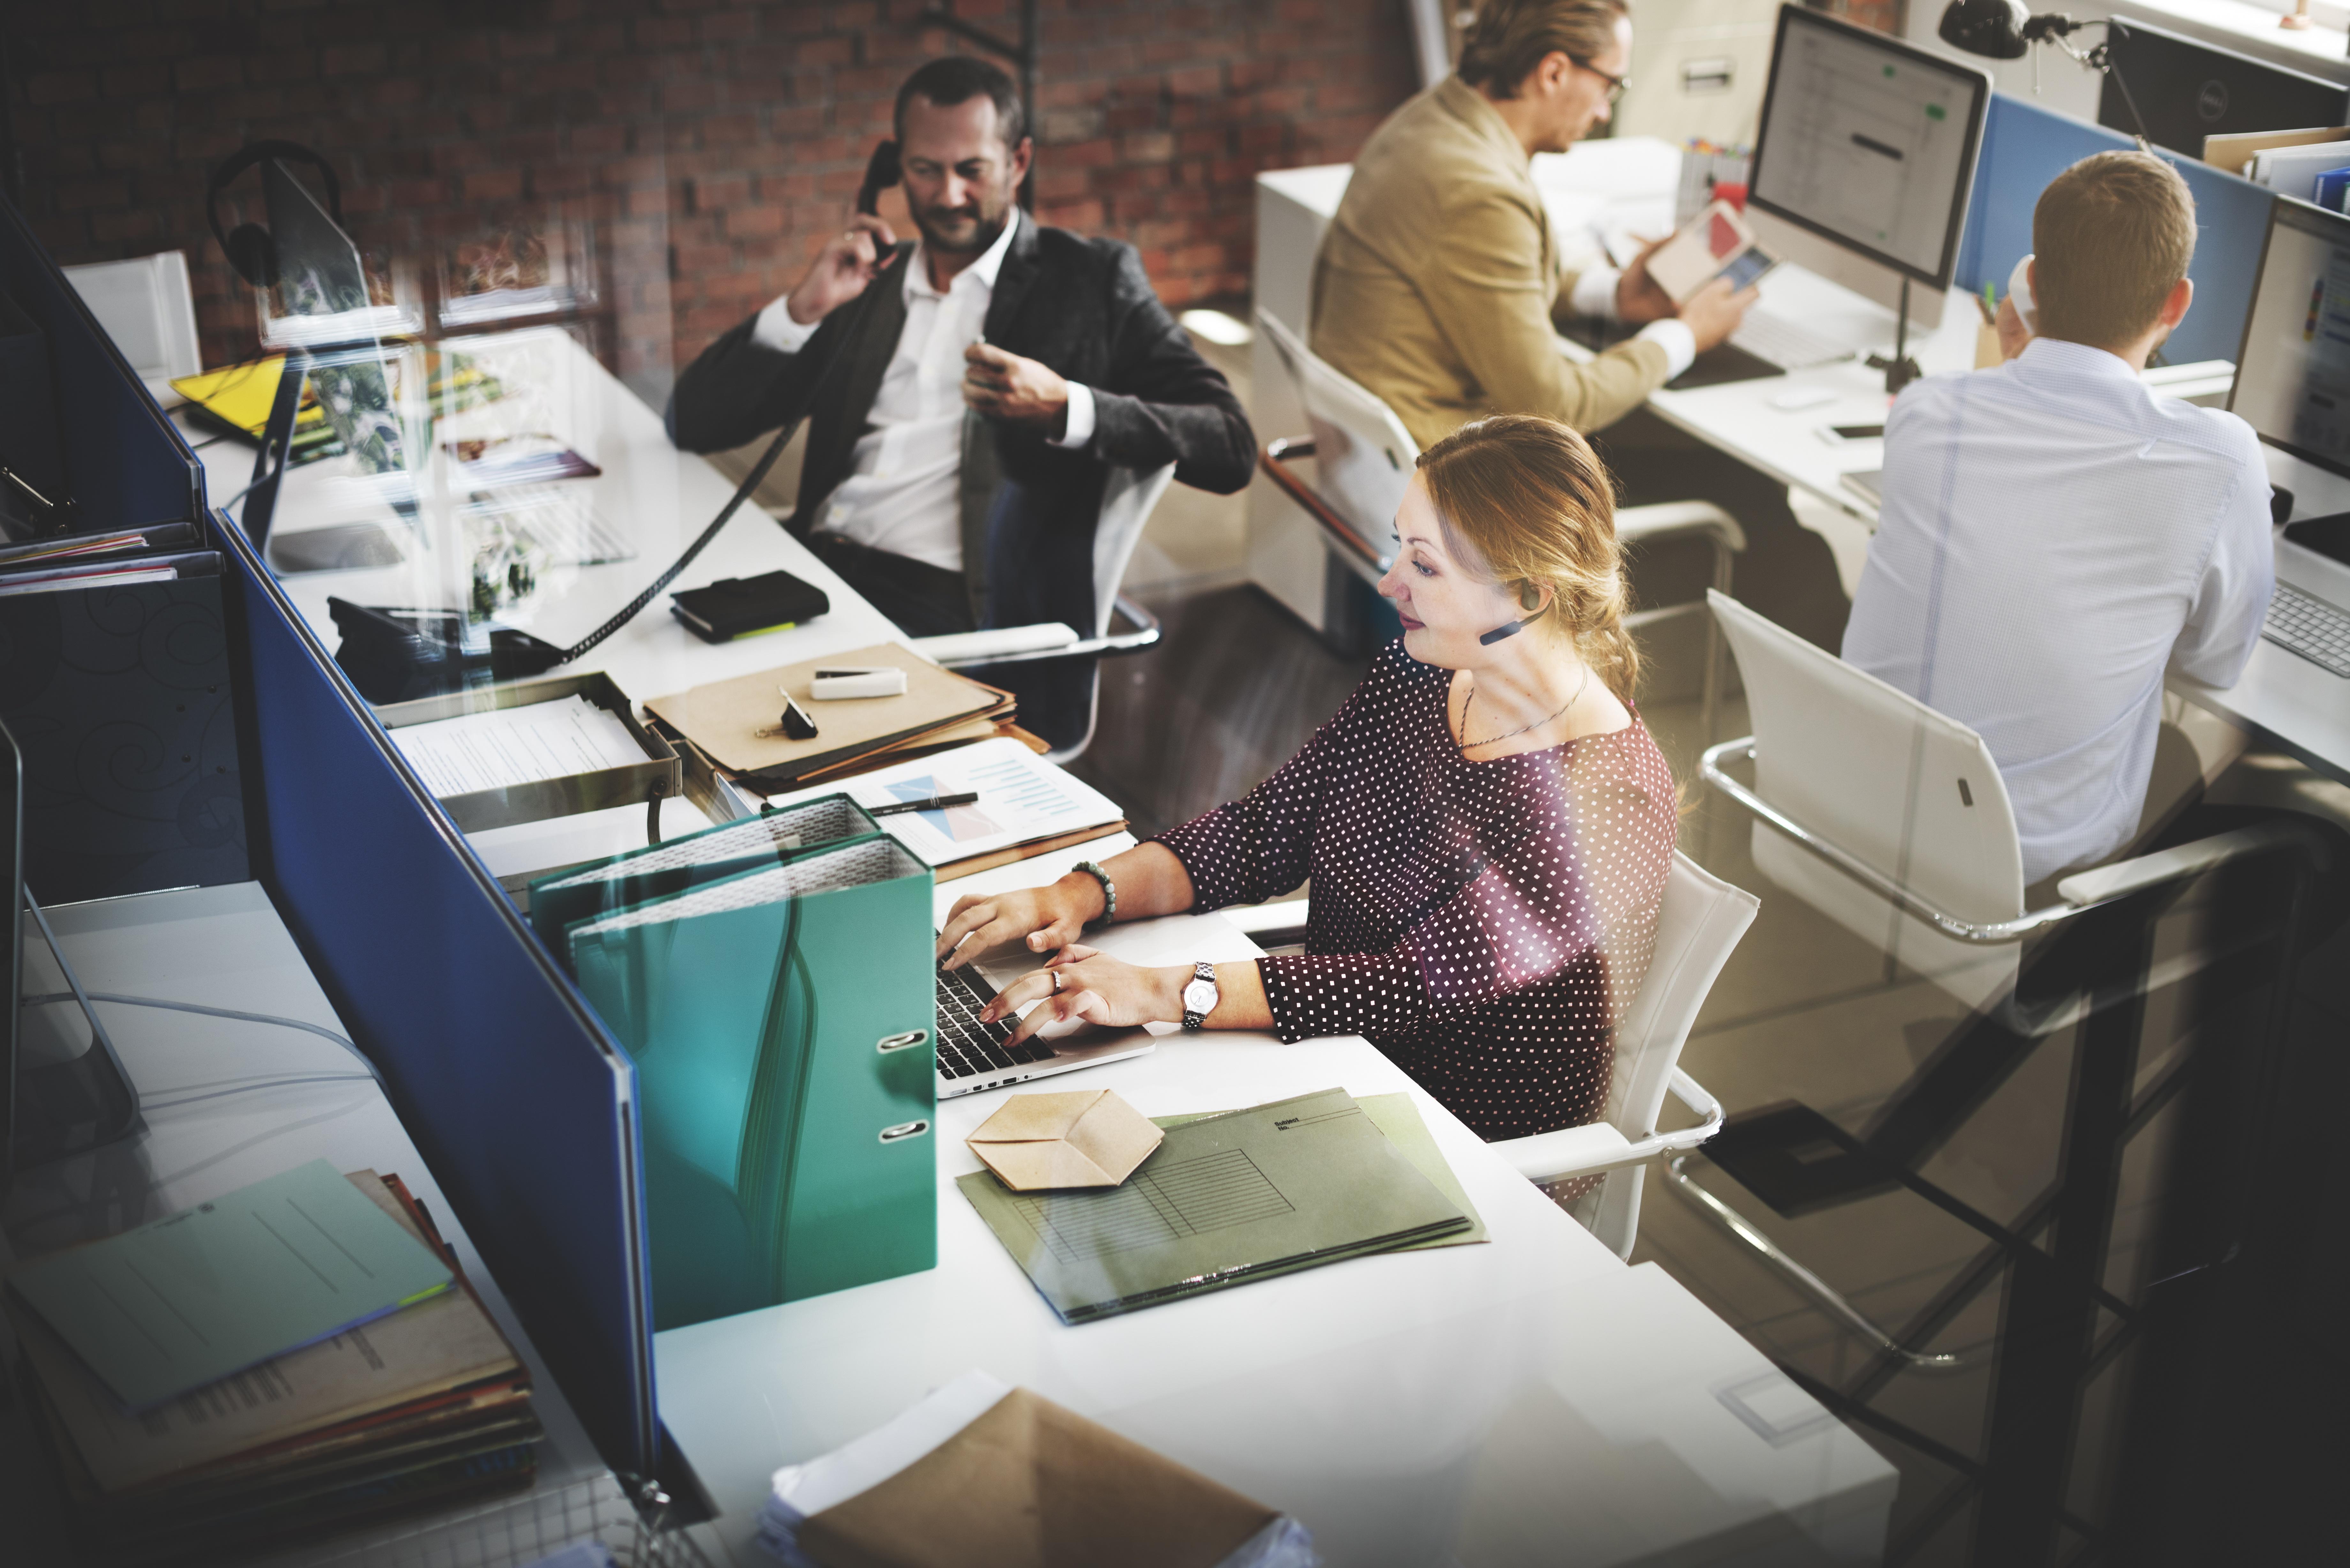 ATOS & UiPath Accelerate Digital Transformation at Large European Public Service Organisation